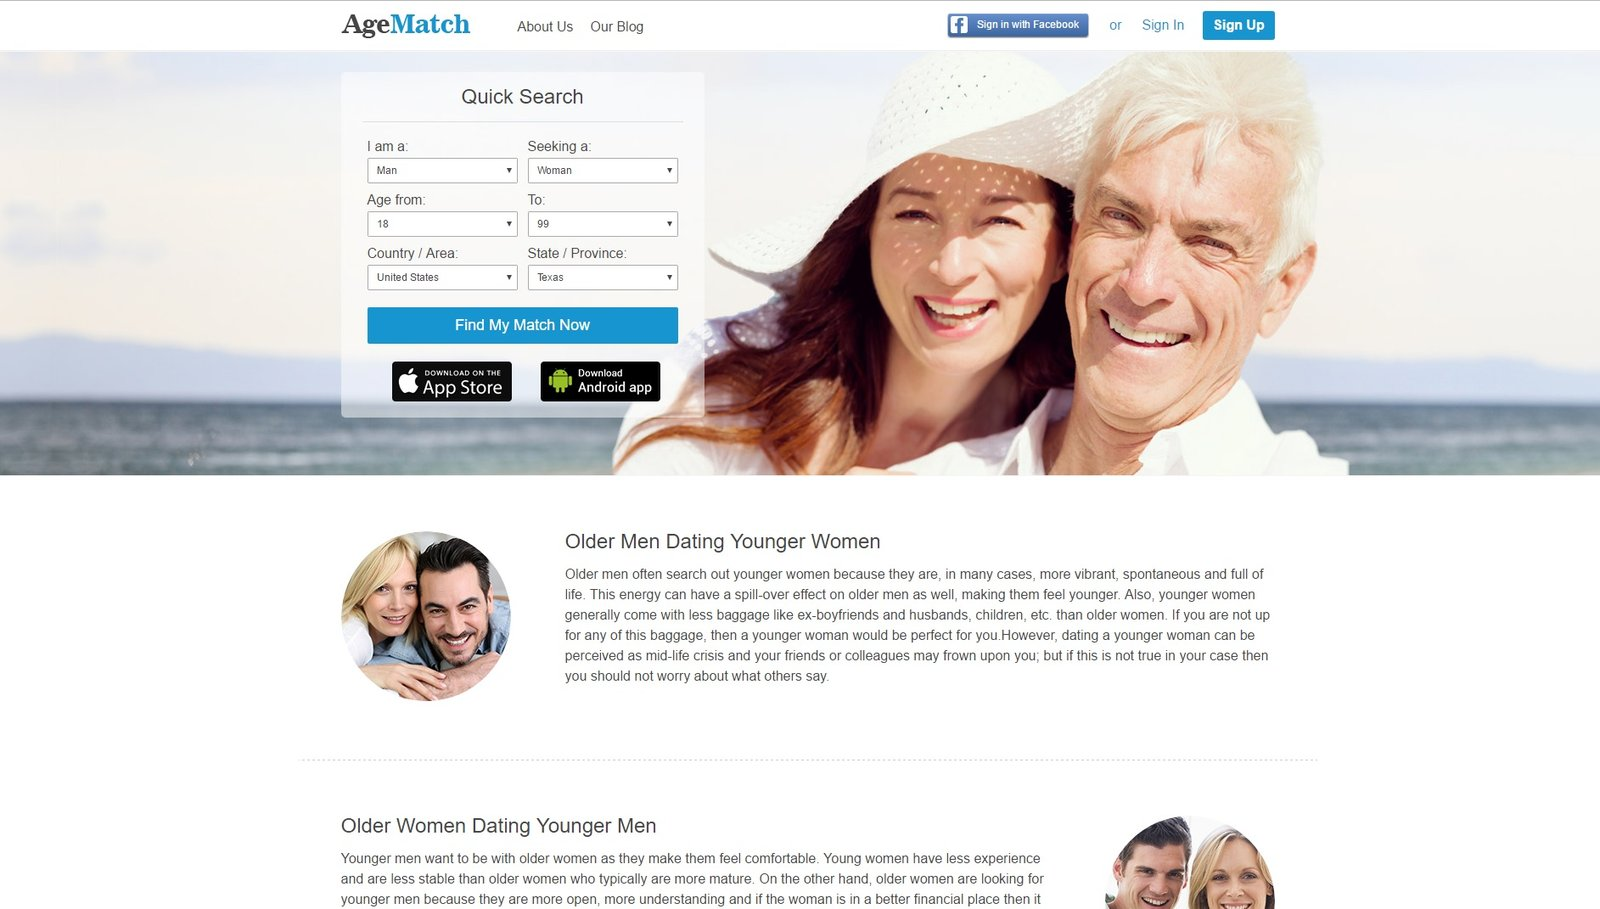 web design of AgeMatch